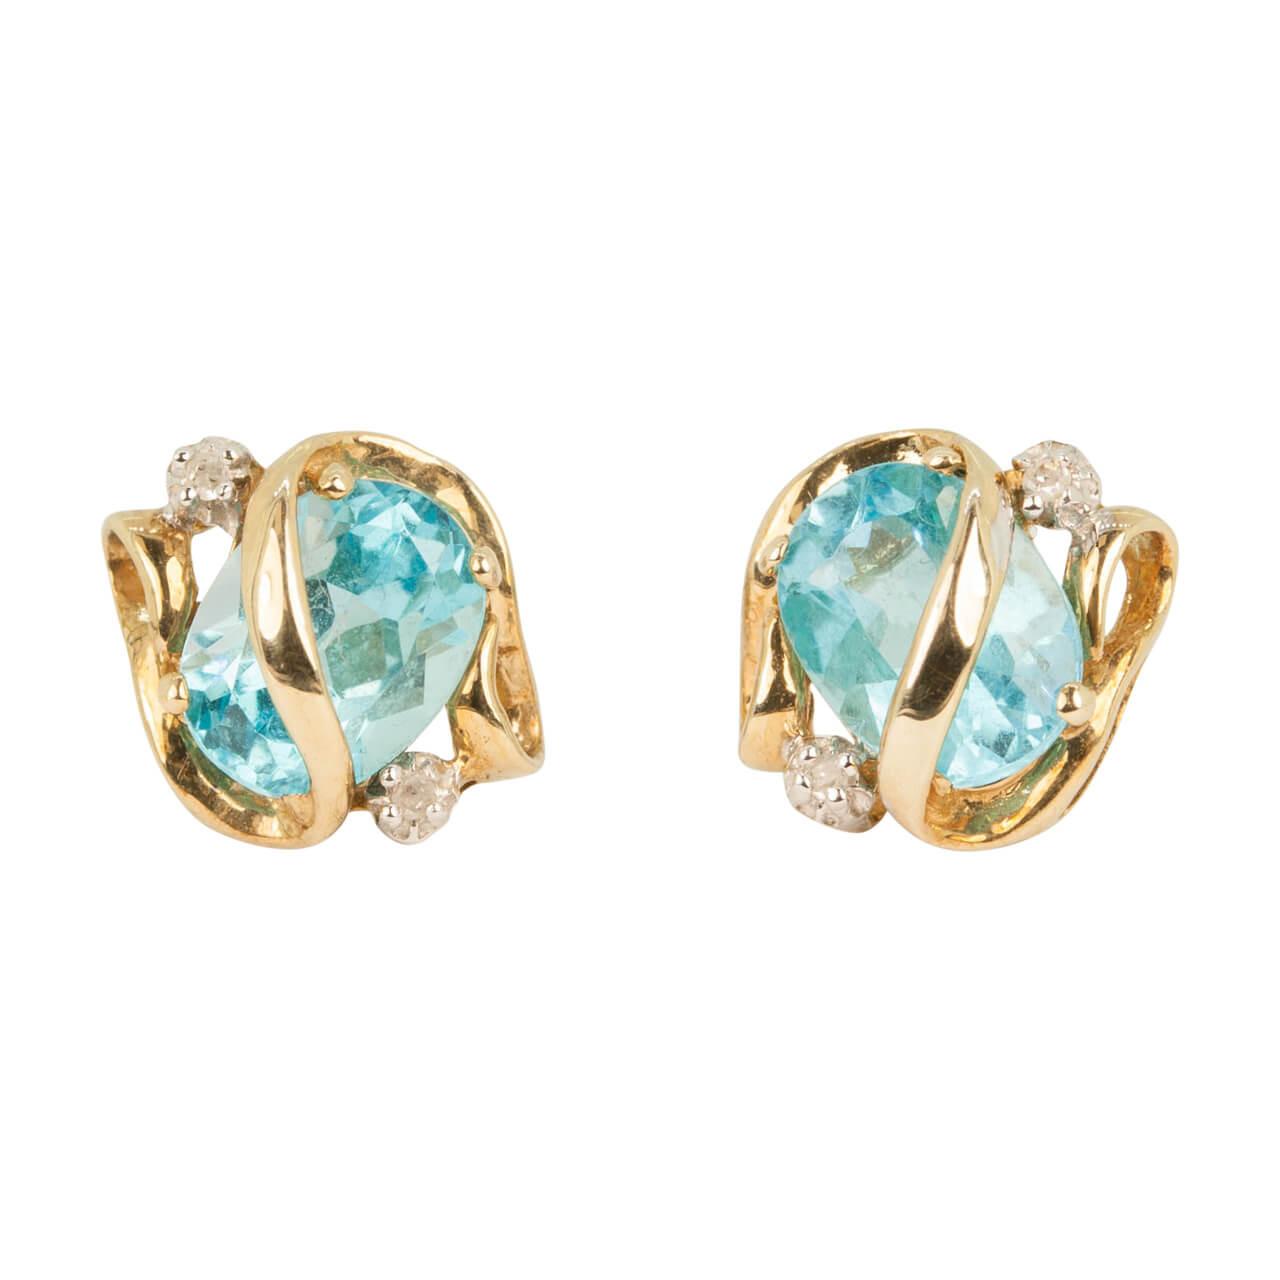 ac17601672963 Second Hand 9ct Gold Blue Topaz & Diamond Stud Earrings